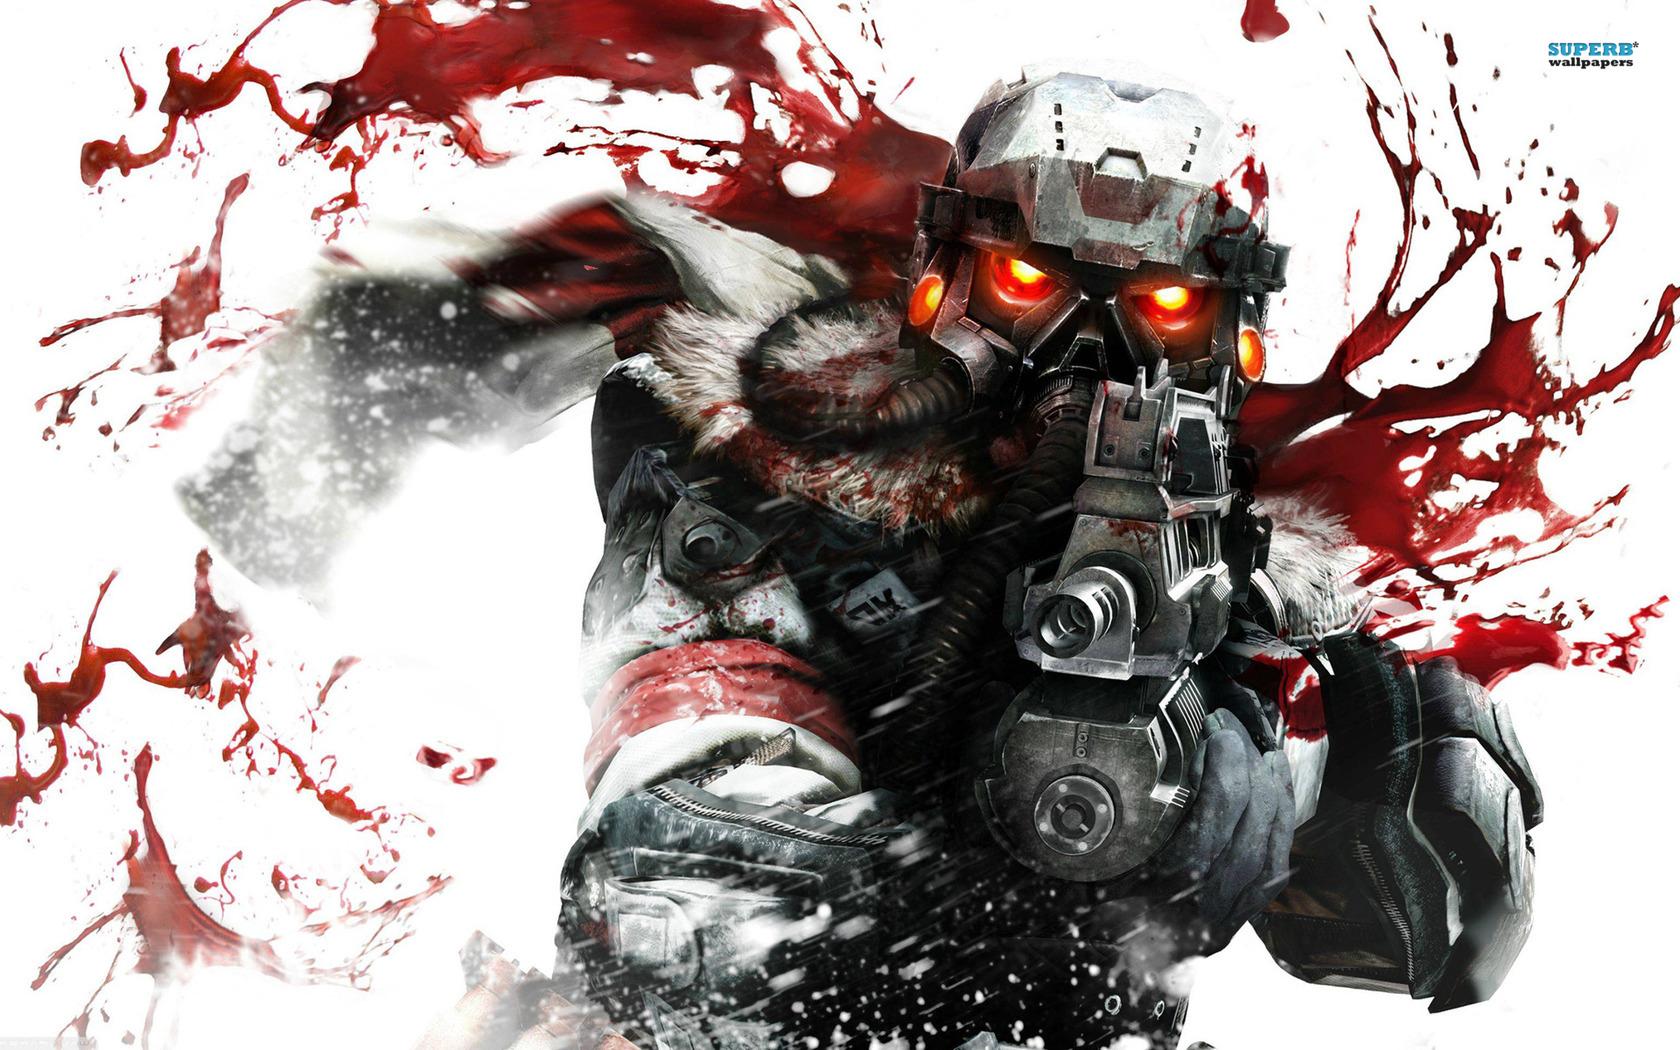 Killzone 3 wallpaper 1680x1050